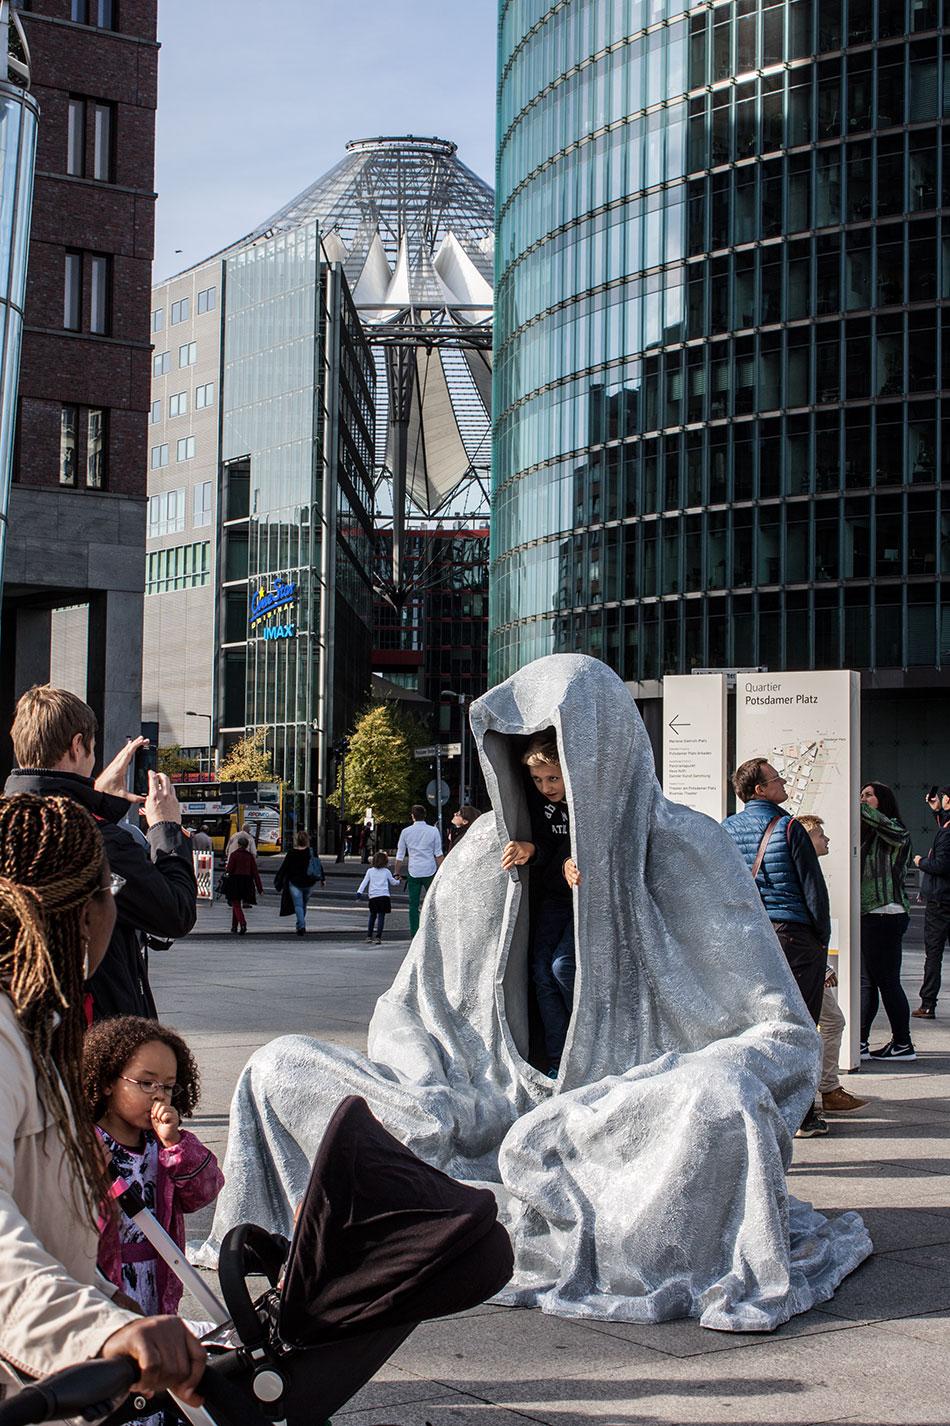 festival-of-lights-berlin-potzdamer-platz-light-art-show-exhibition-lumina-guardians-of-time-manfred-kili-kielnhofer-contemporary-arts-design-sculpture-3089